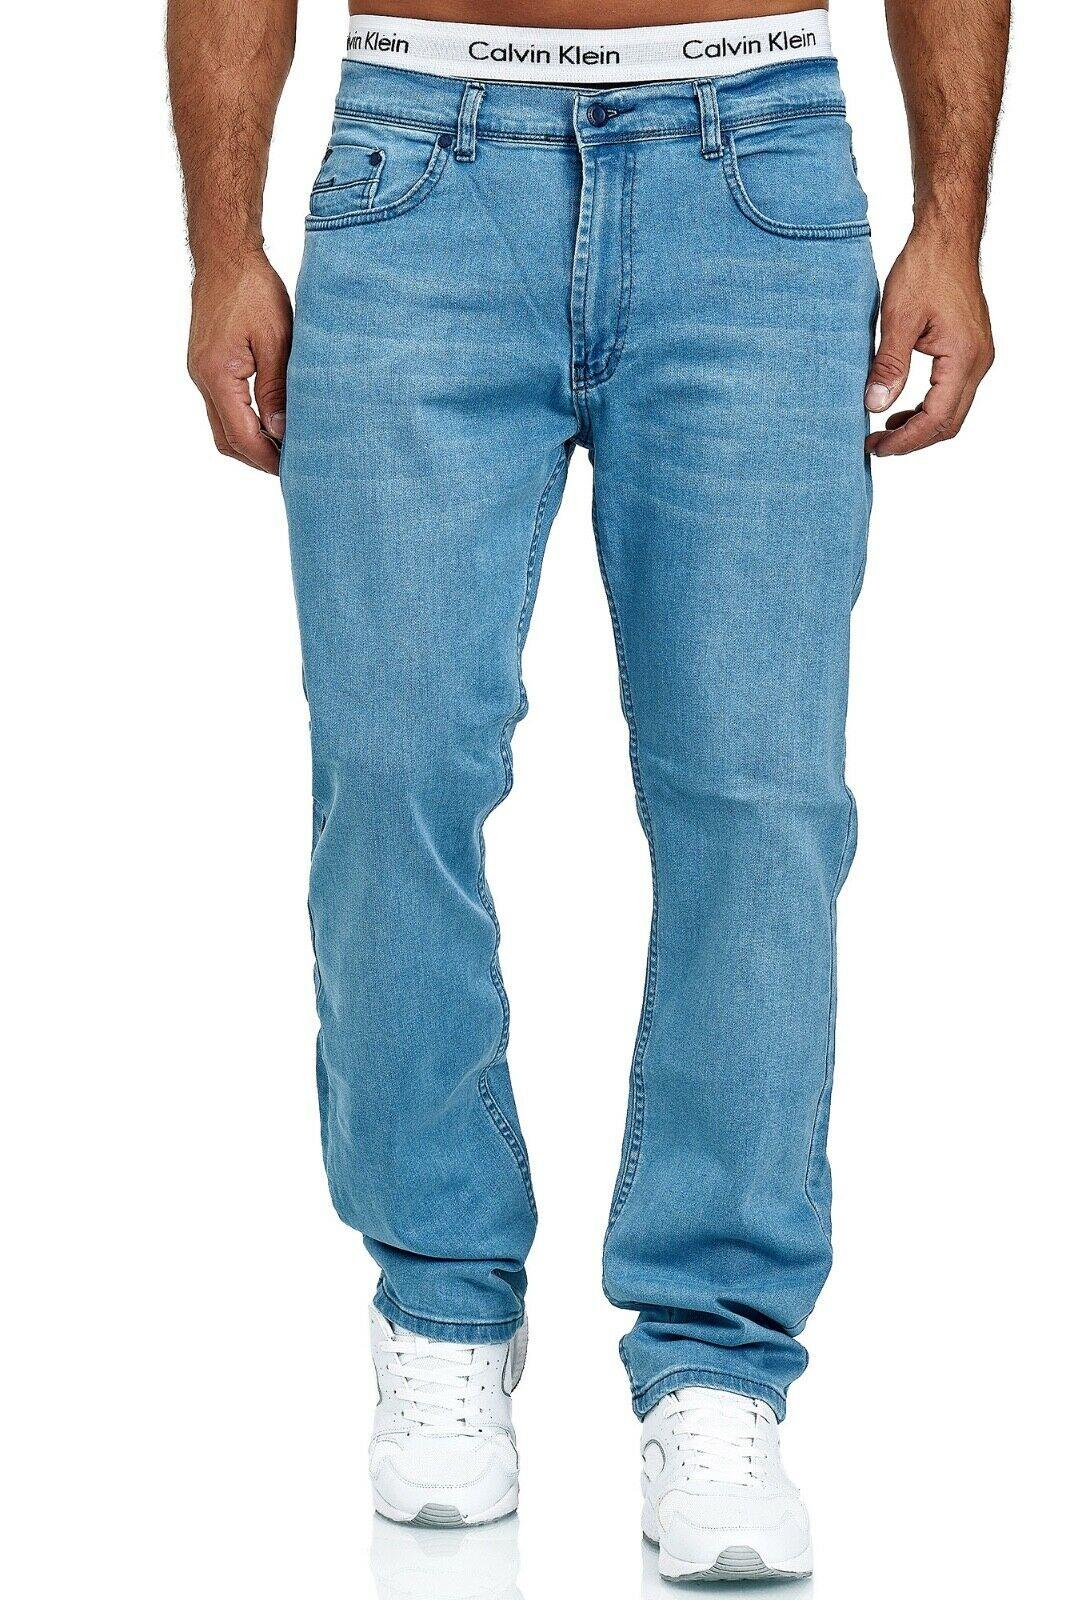 Herren-Jeans-Hose-Denim-KC-Black-Washed-Straight-Cut-Regular-Dicke-Naht-naehte Indexbild 71